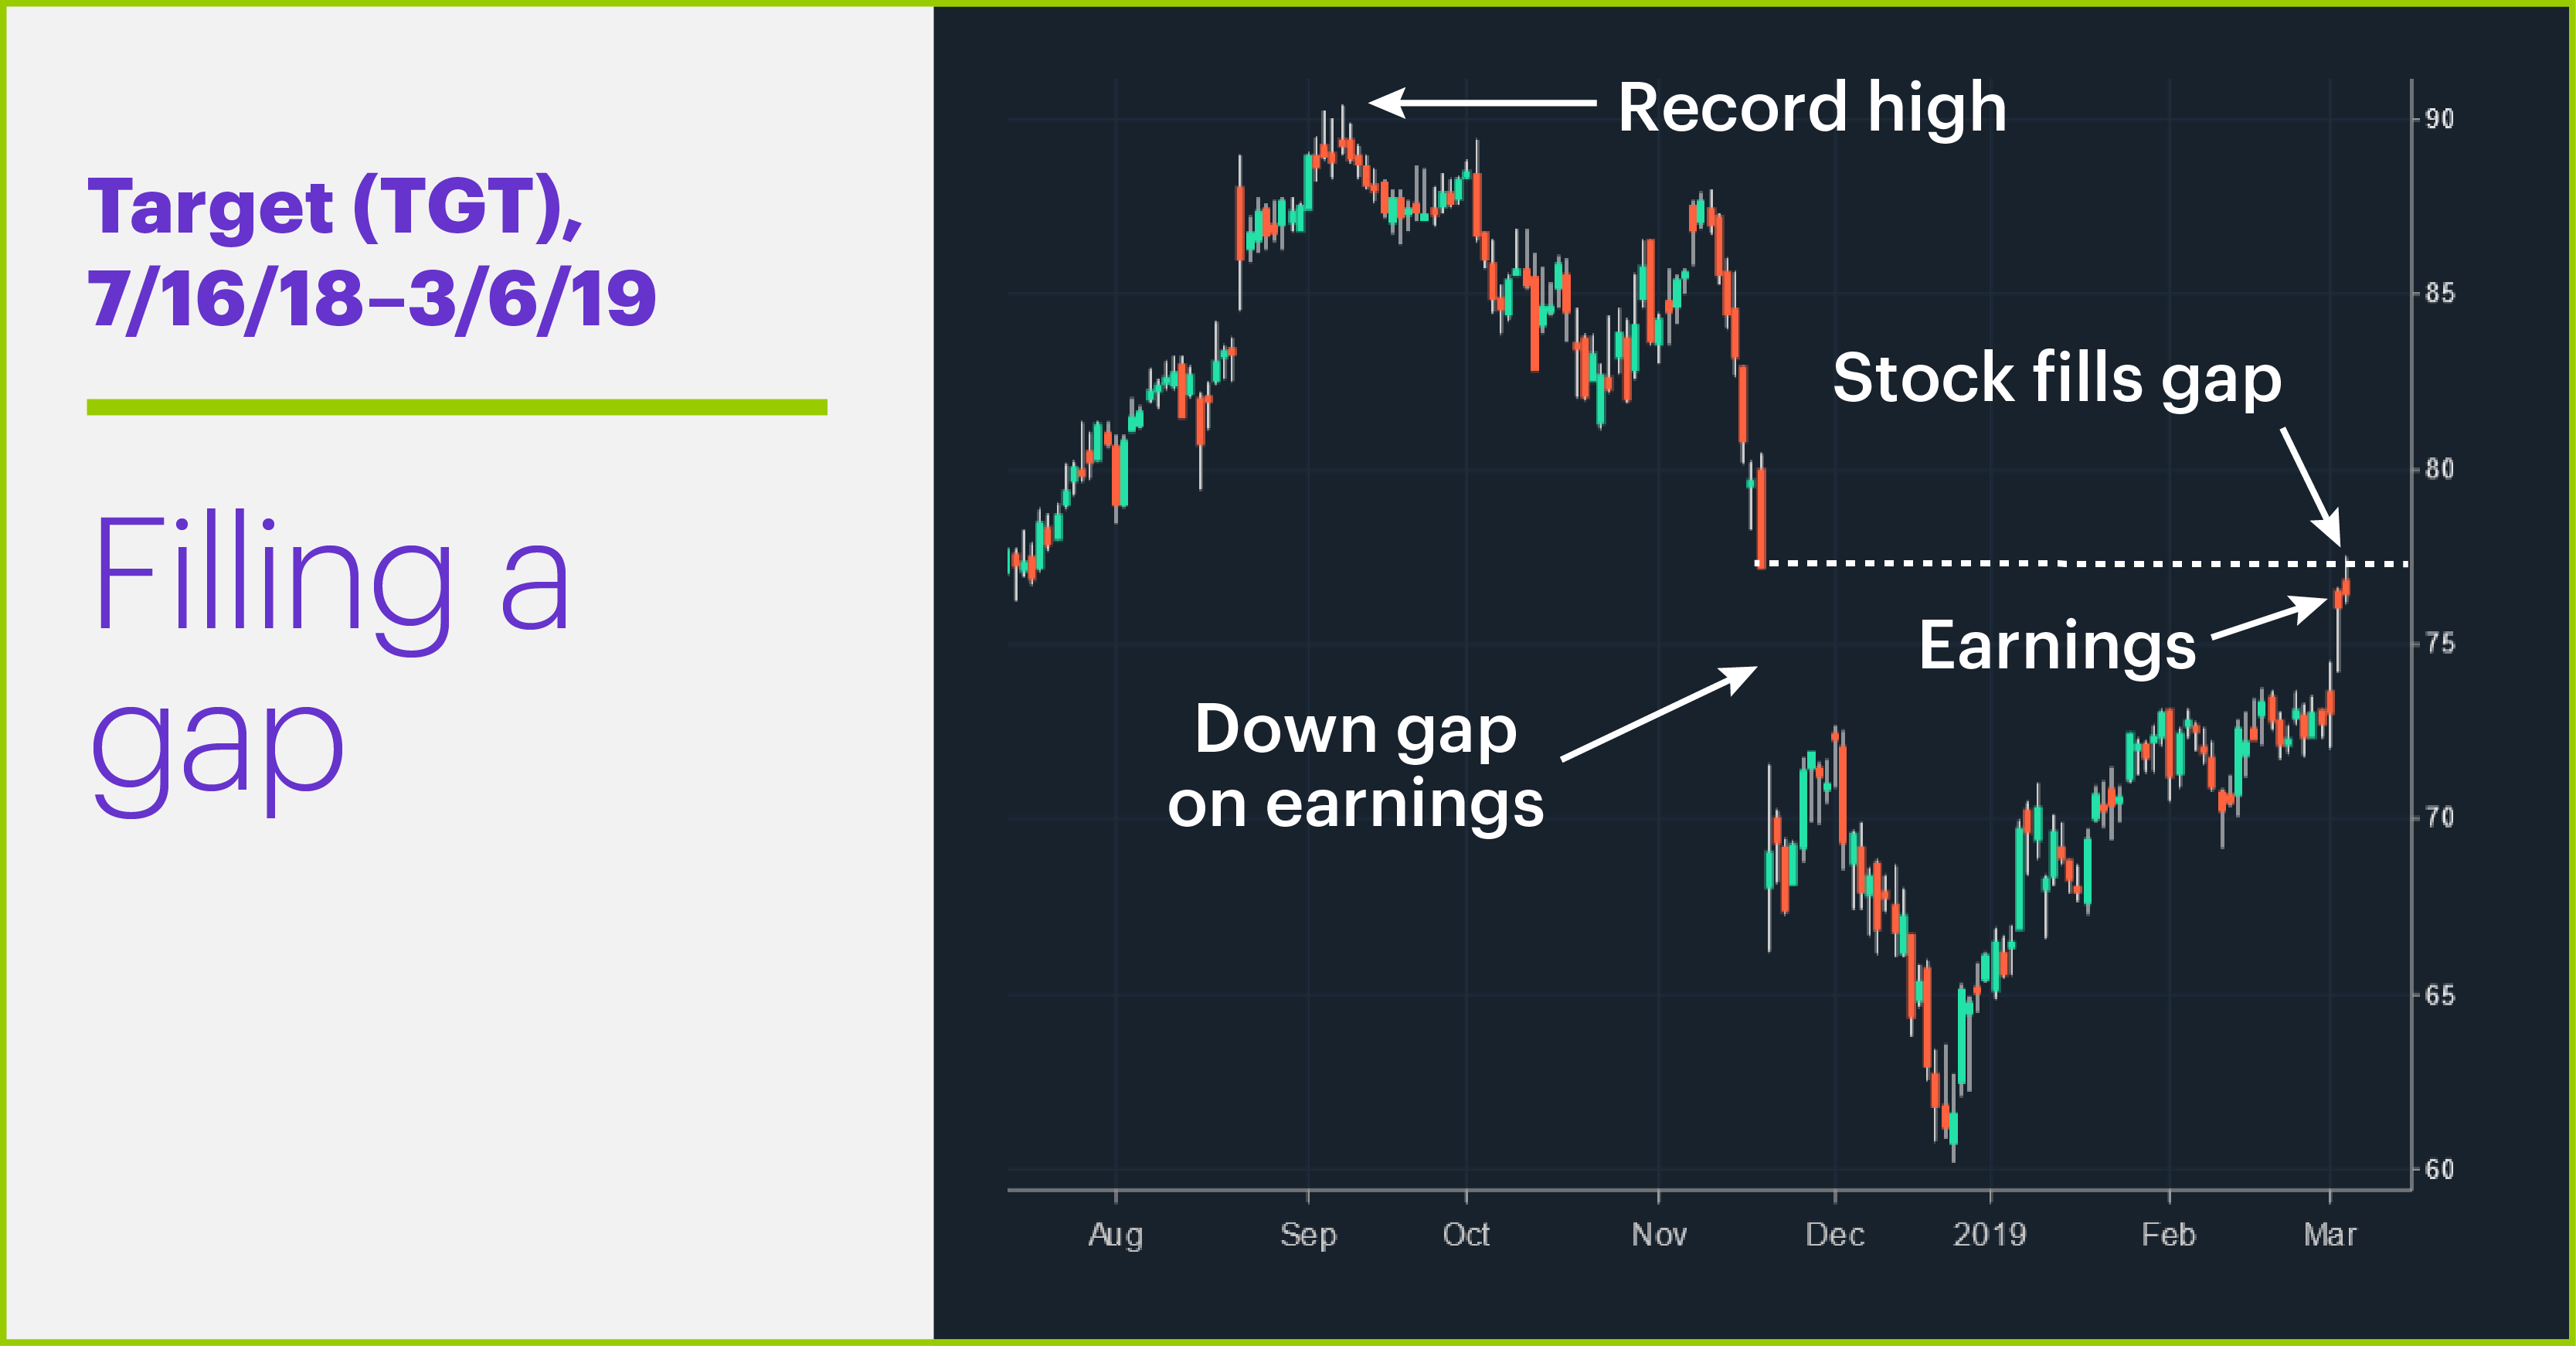 Target (TGT), 7/16/18–3/6/19. Target (TGT) price chart. Filling a gap.